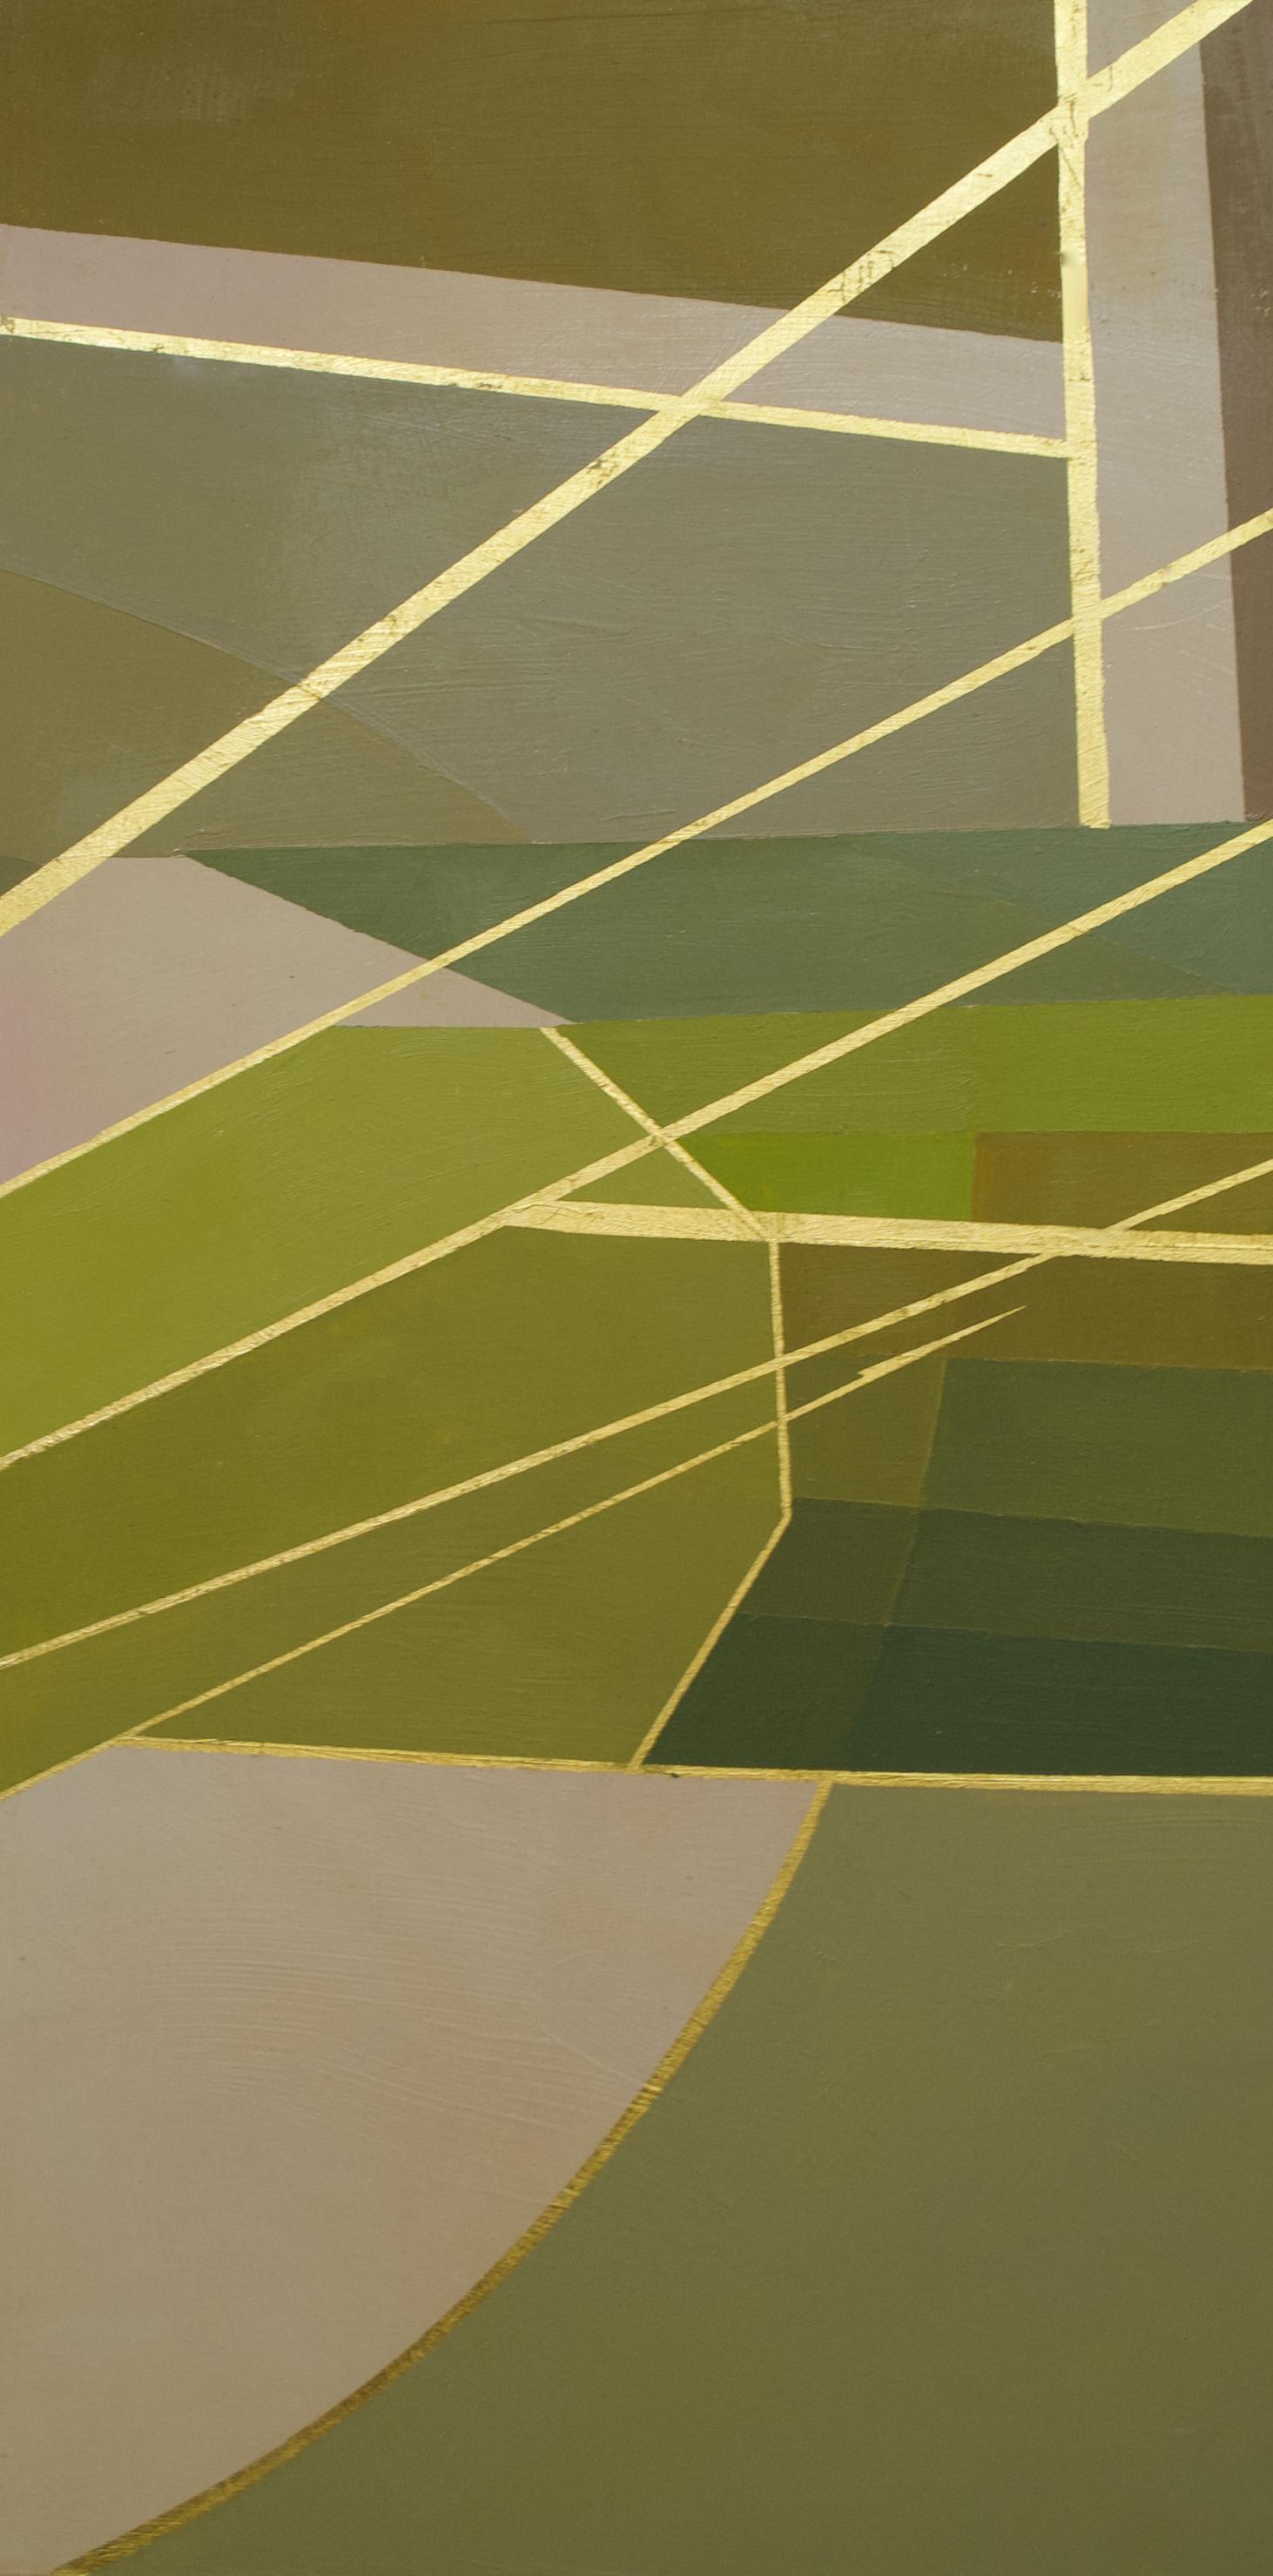 "Wonderwheel #41 - 20"" x 10"" oil and gold leaf on panel$650"